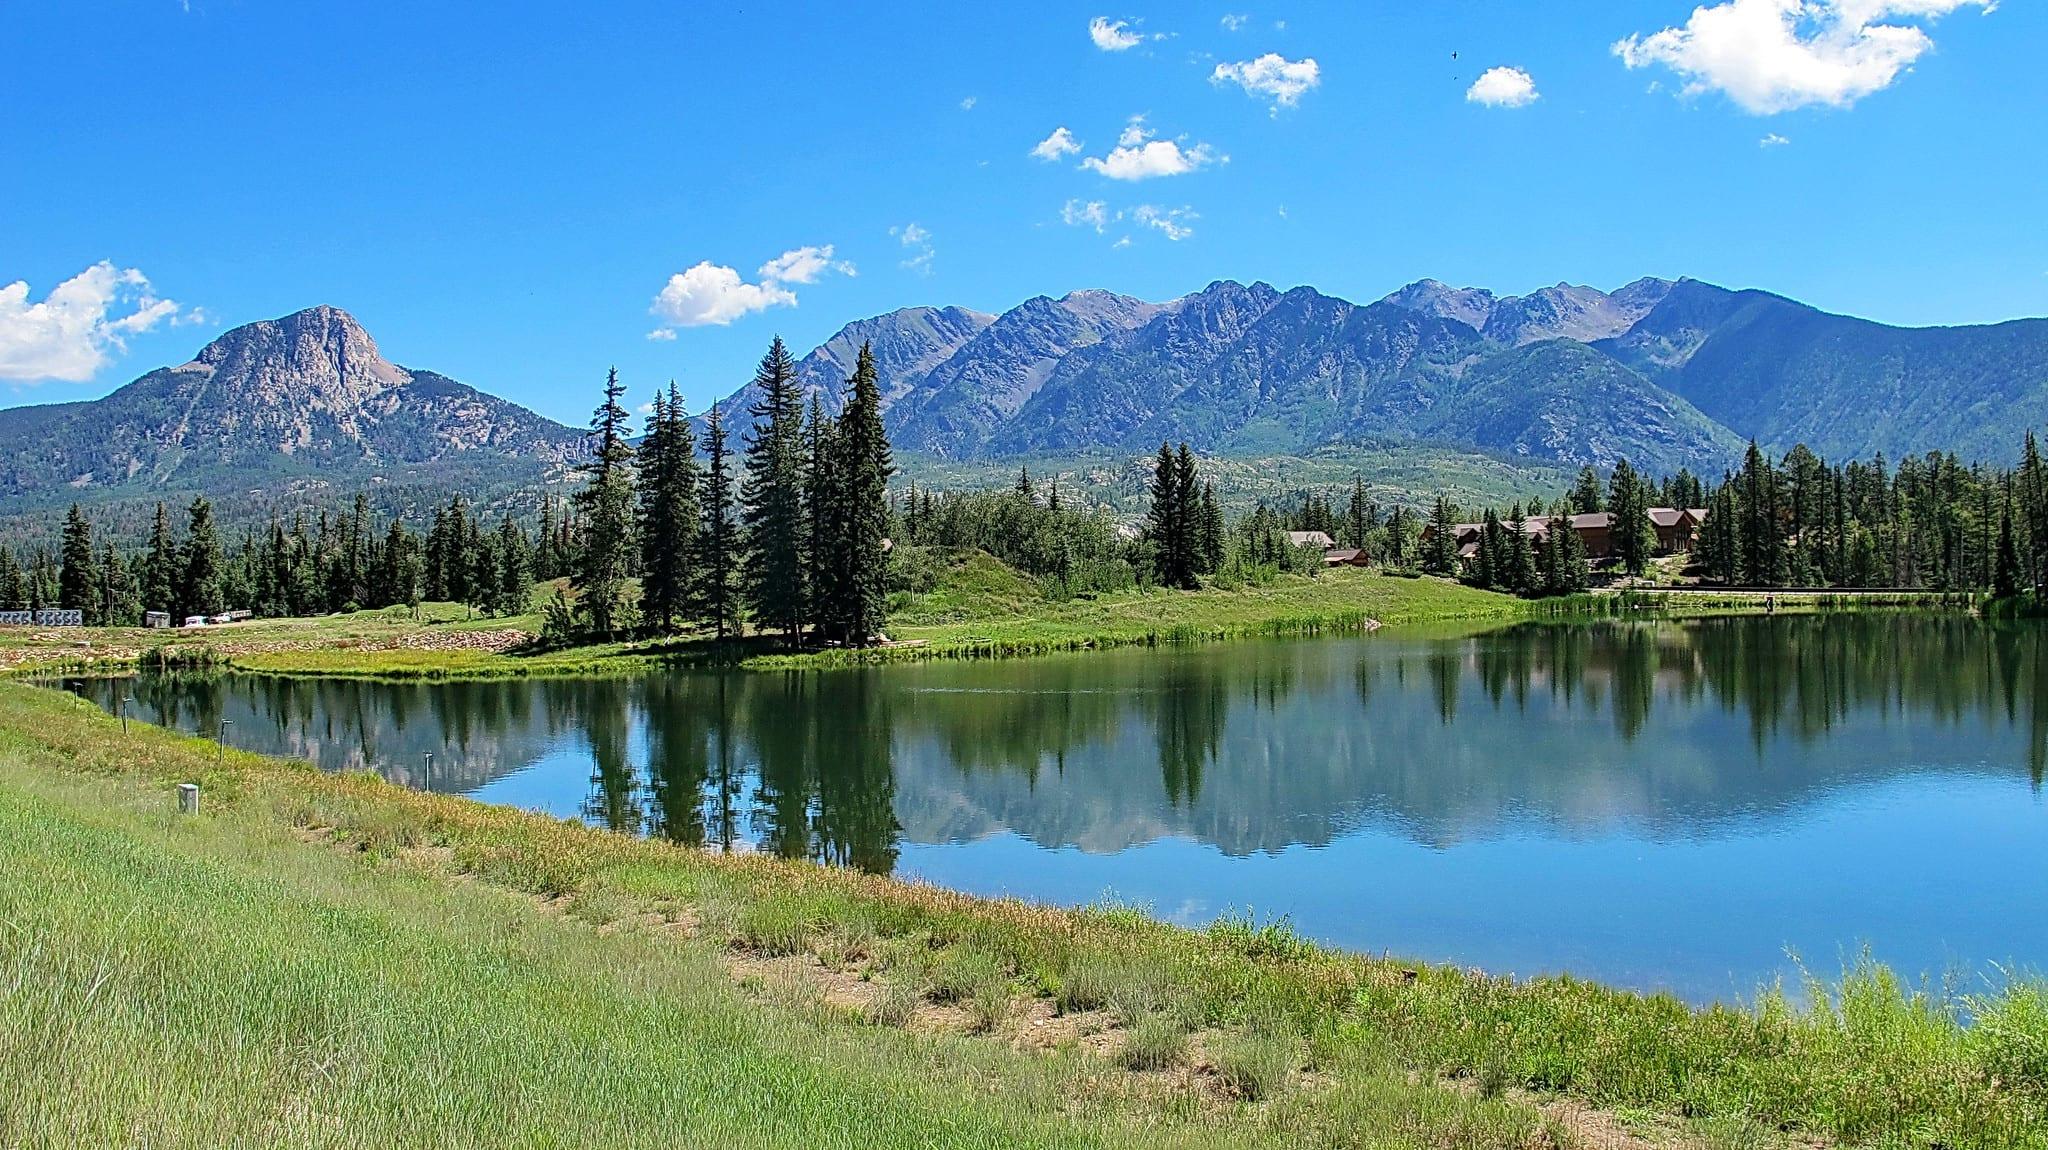 image of purgatory trail near Durango